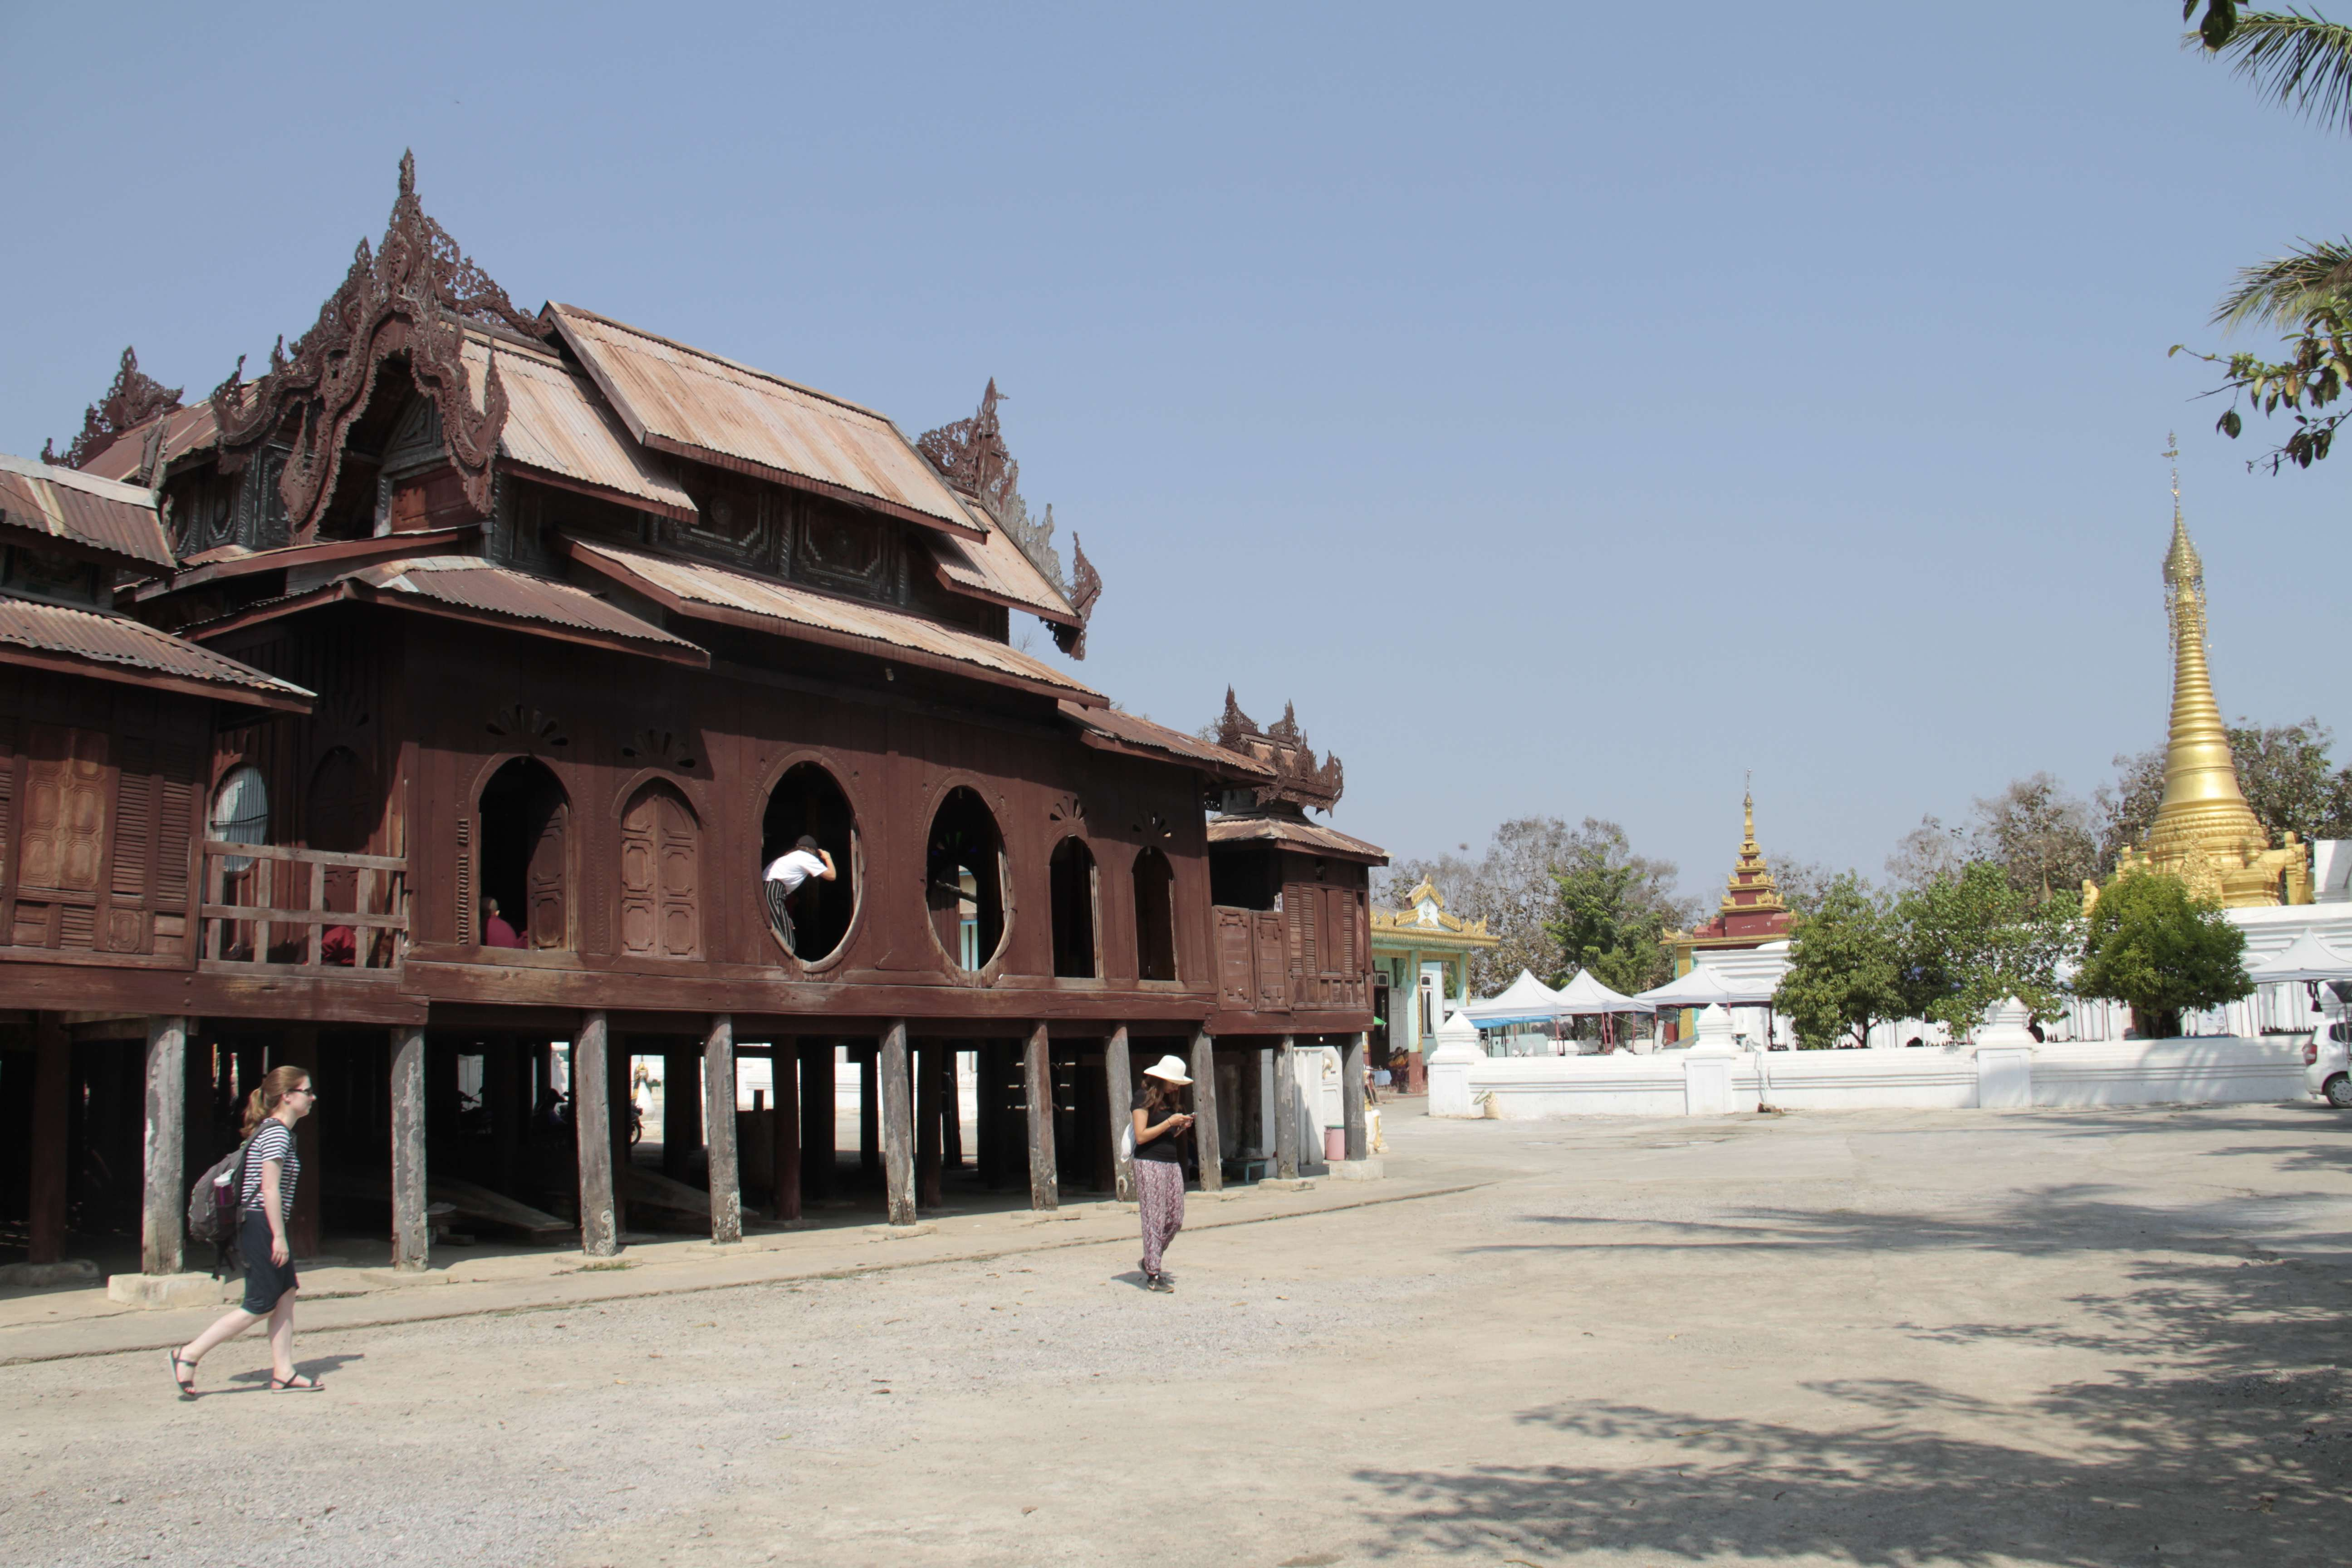 Myanmar fevrier 2019_0810 Niaungswhe Shweyanpyay monastery